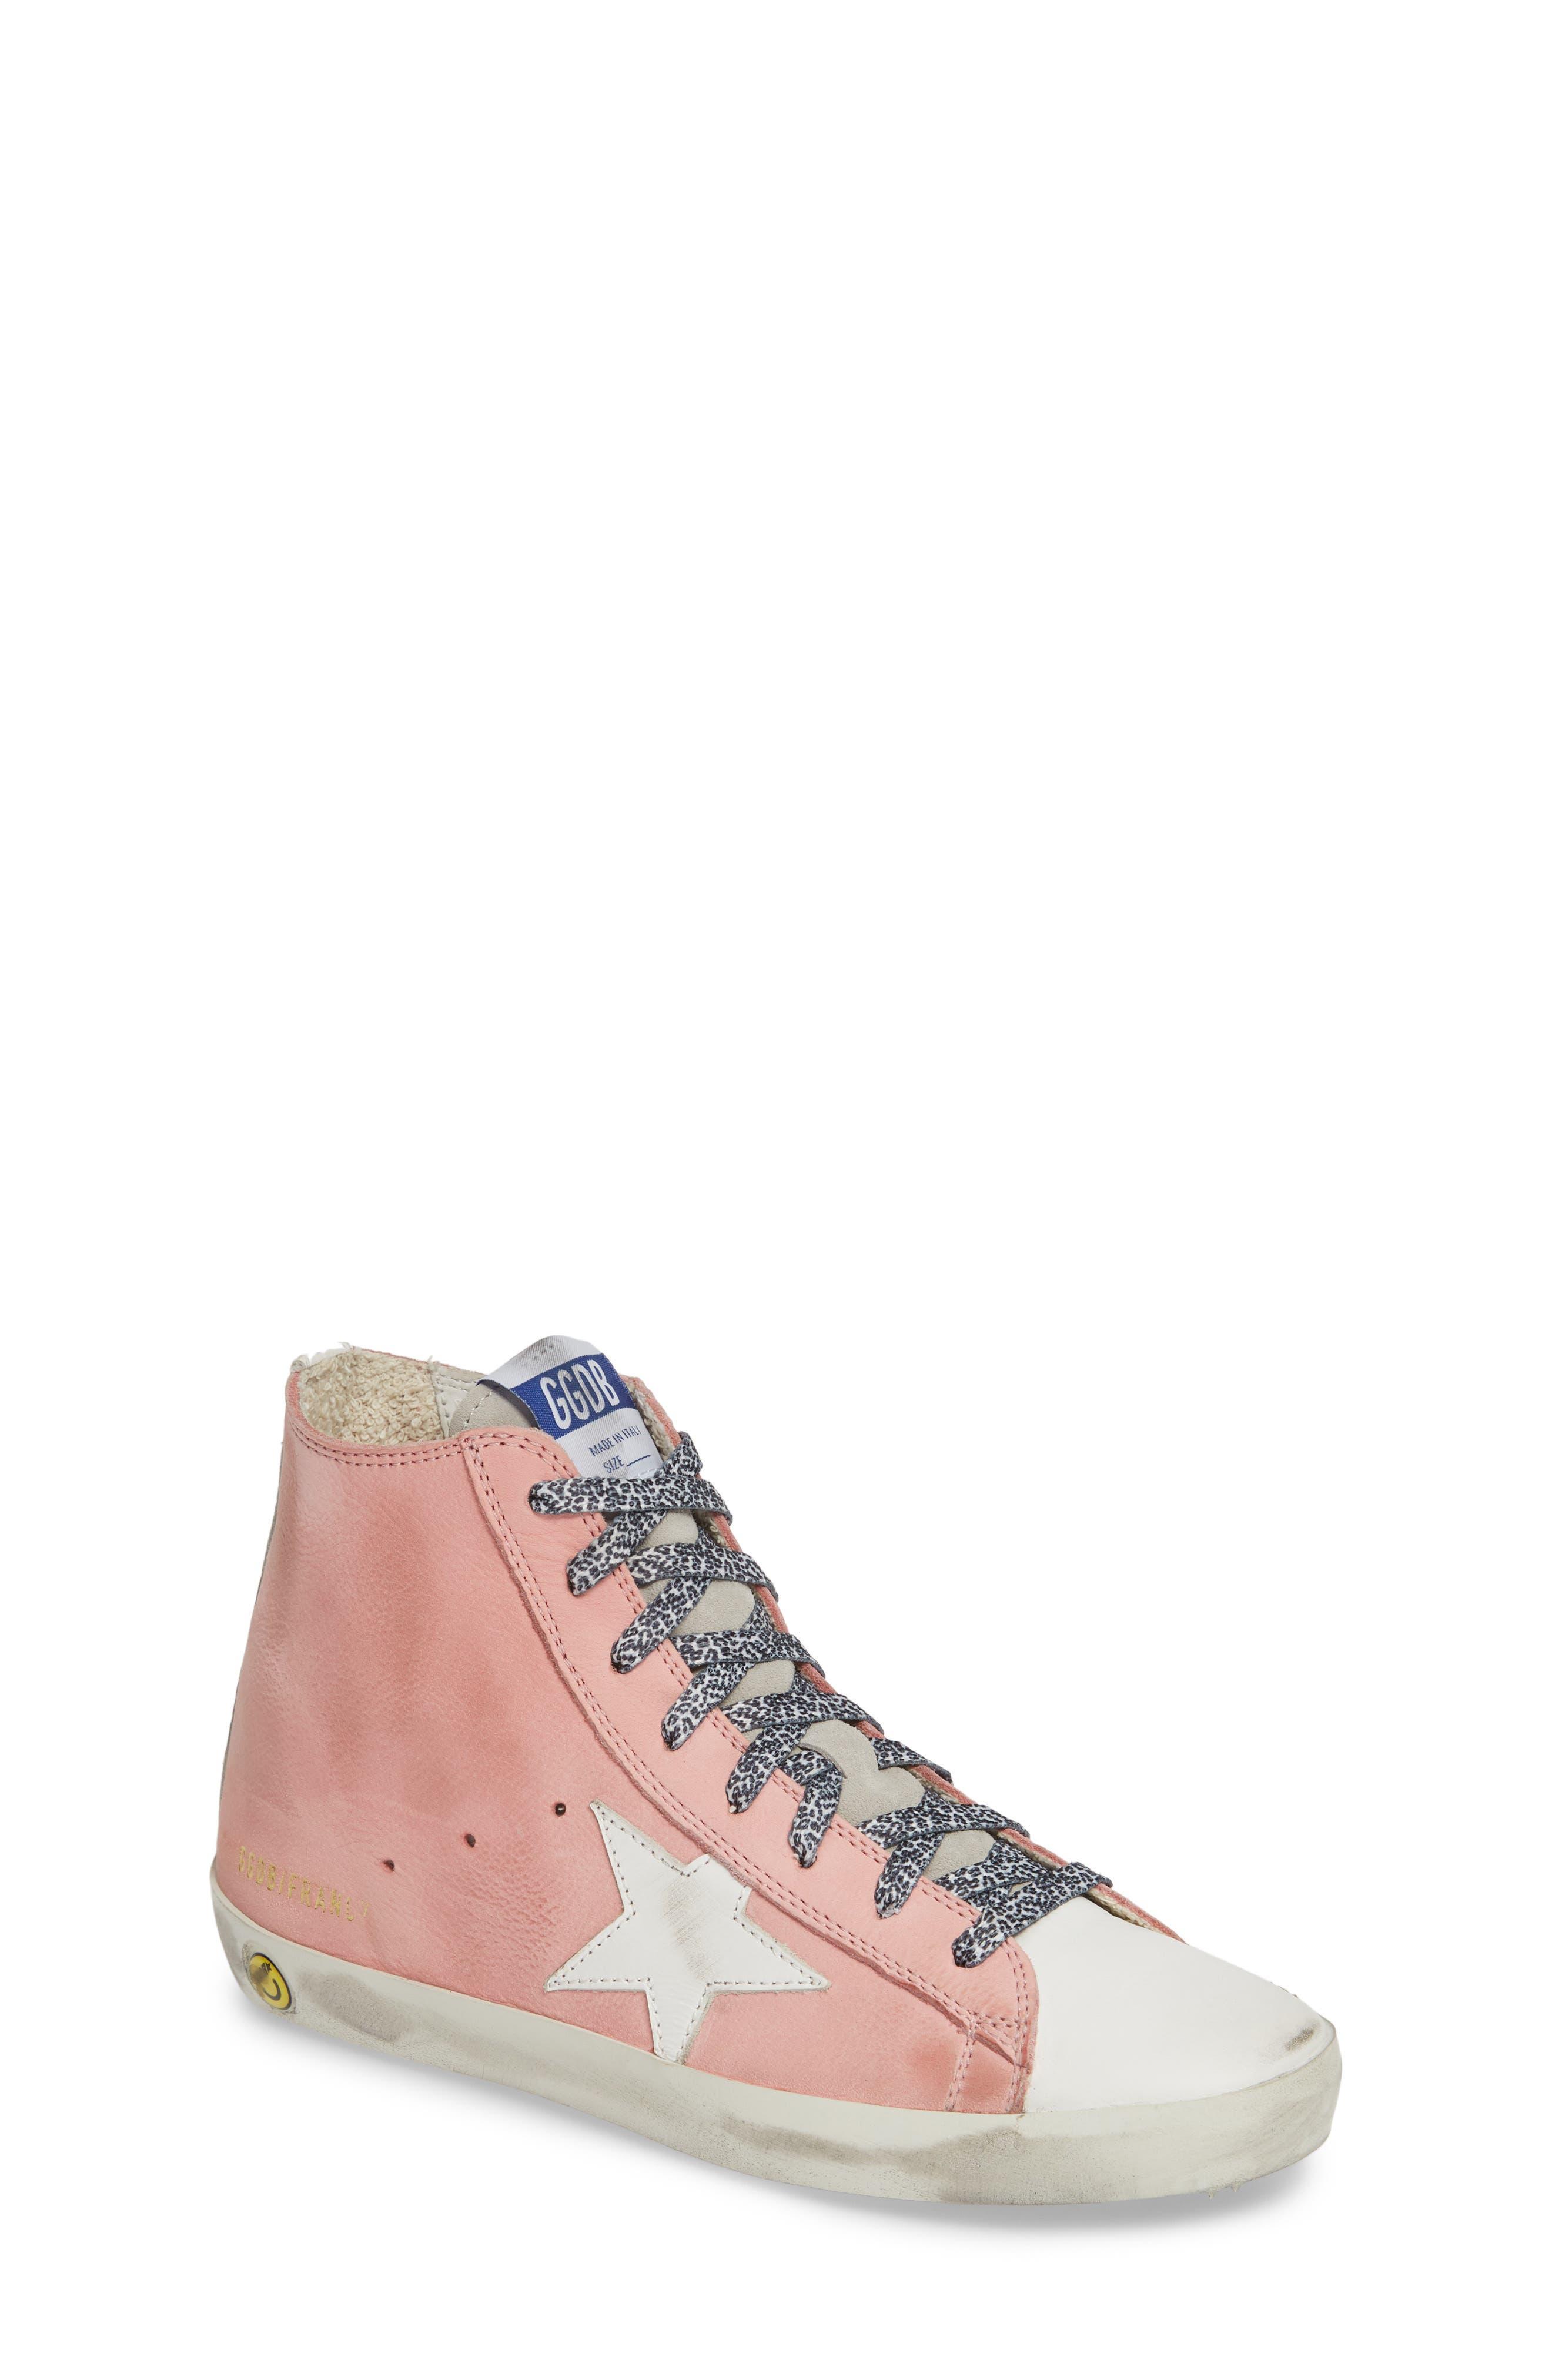 GOLDEN GOOSE Francy High Top Sneaker, Main, color, PINK PEONY